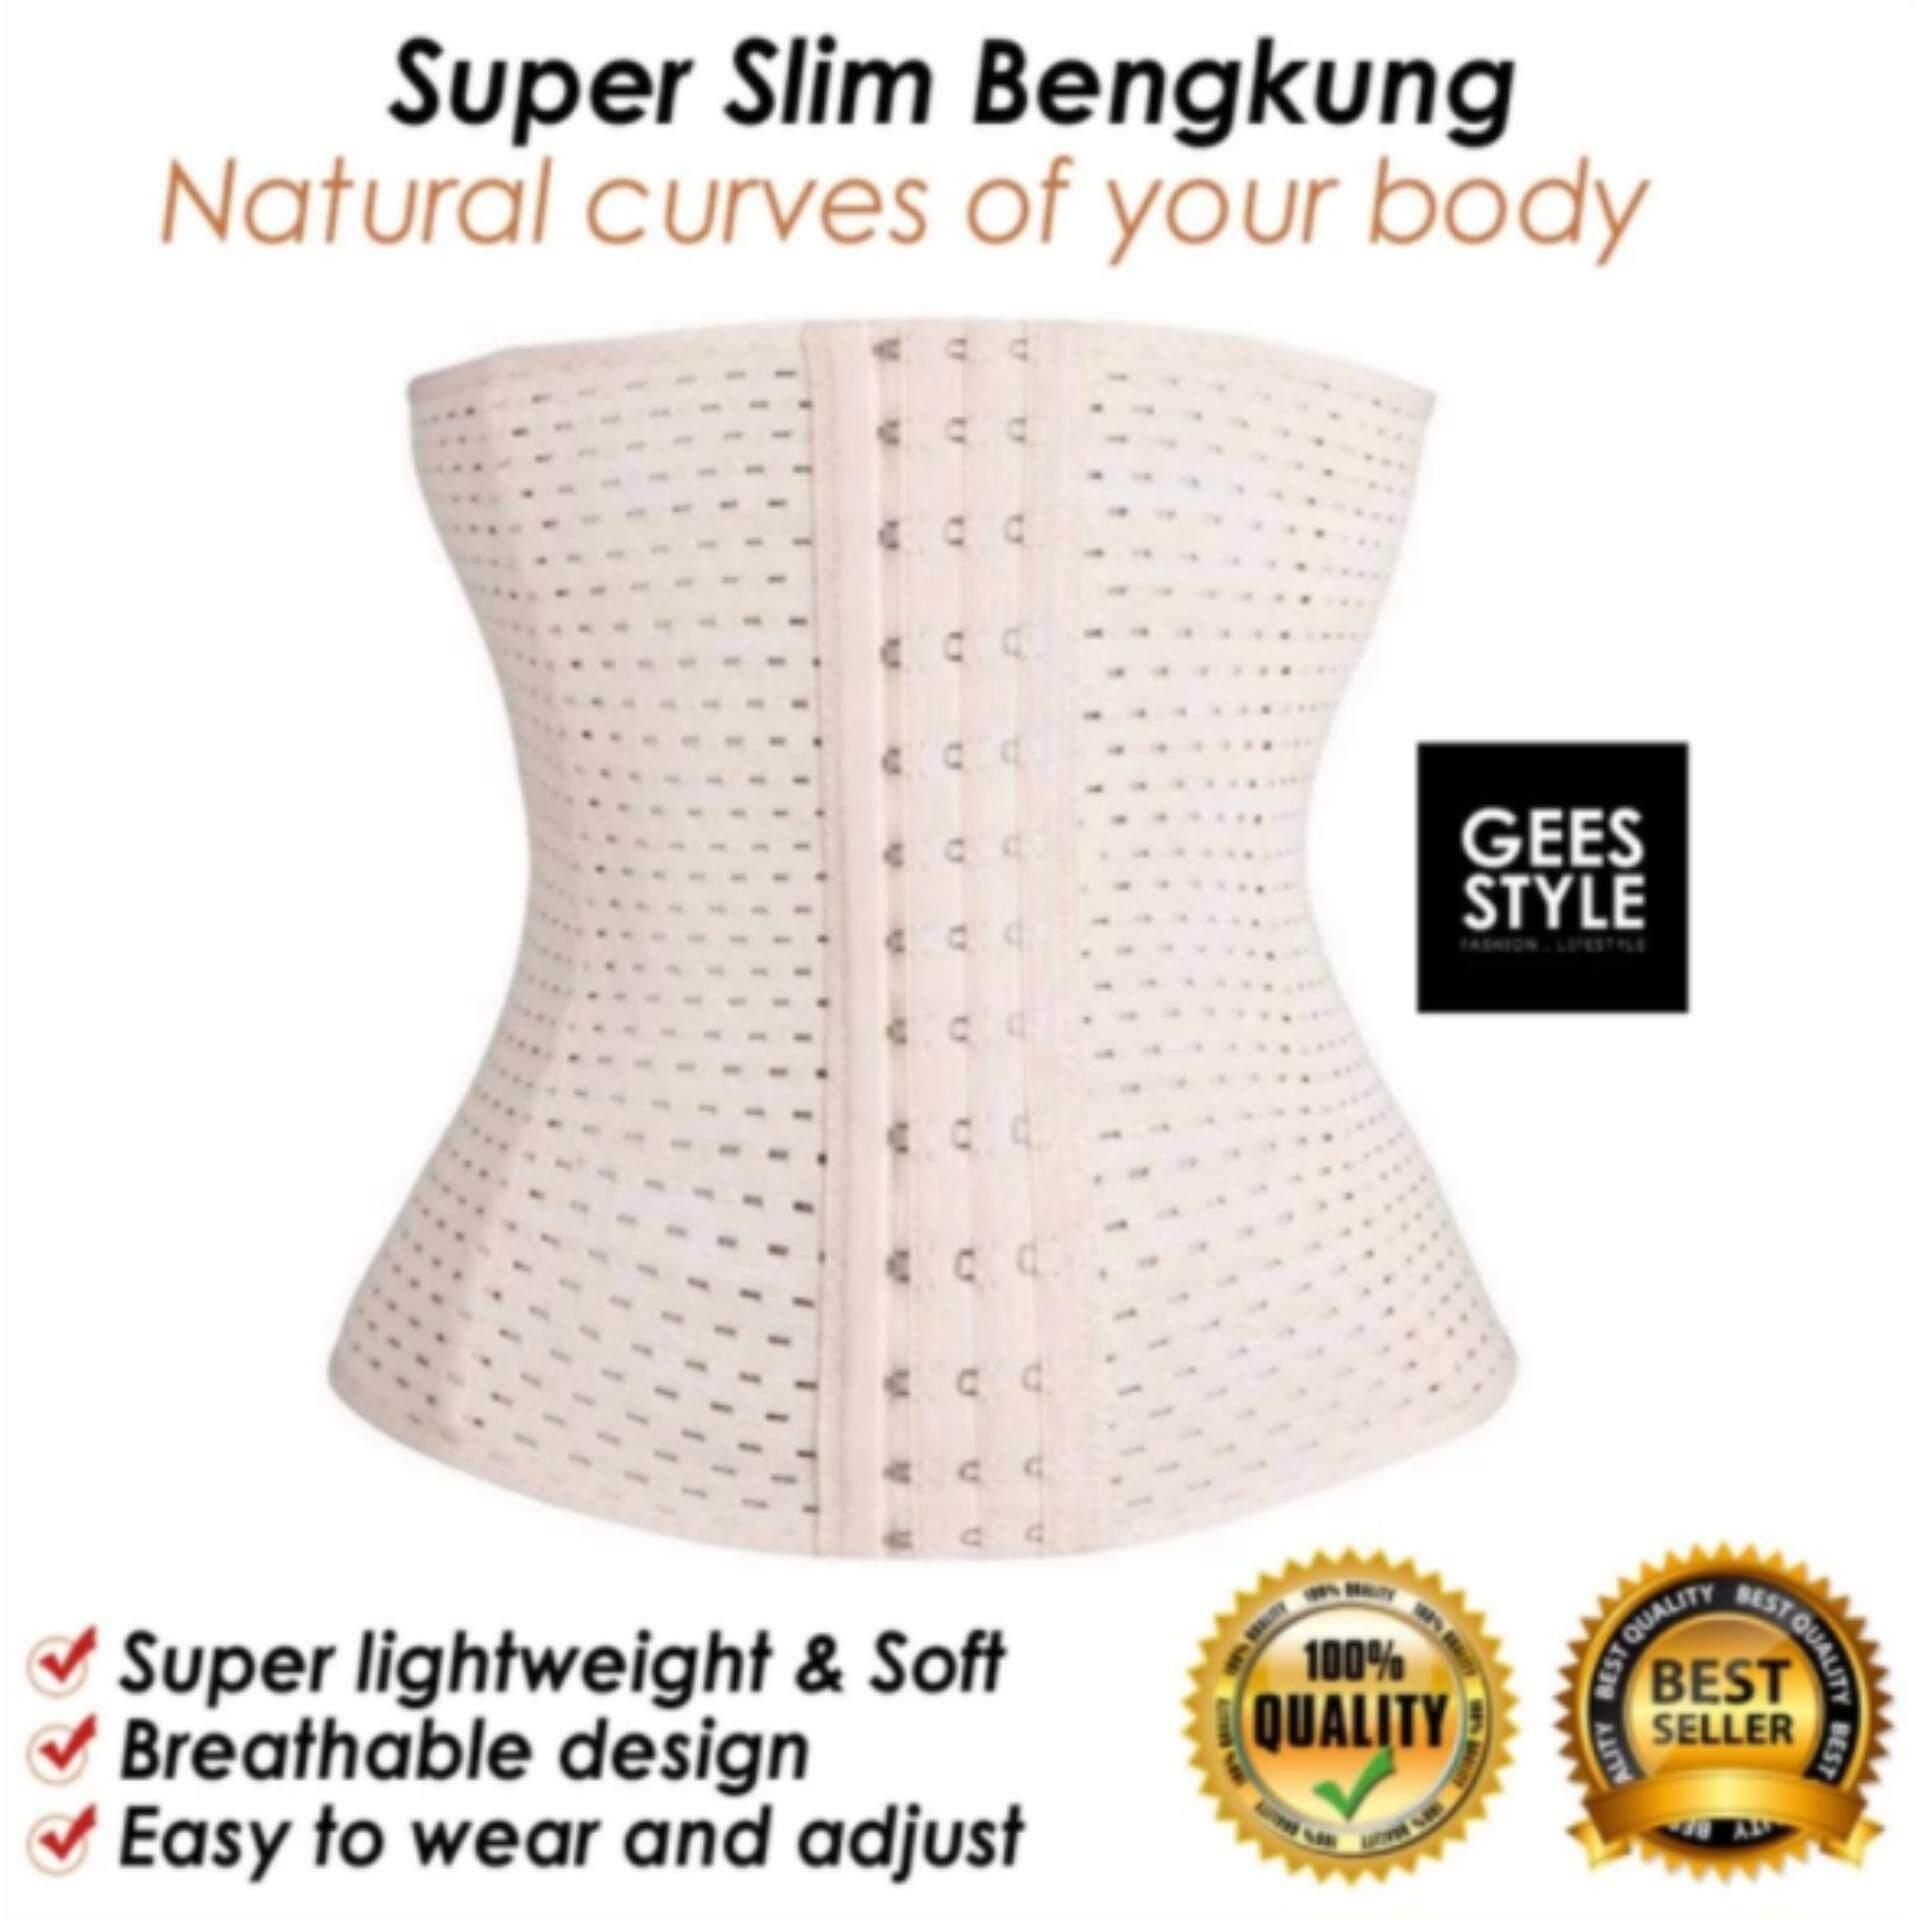 UltraSlim Corset Body Shaping Waist Girdle Tummy Control Slimming Belt Bengkung (BLACK) LOCAL SELLER